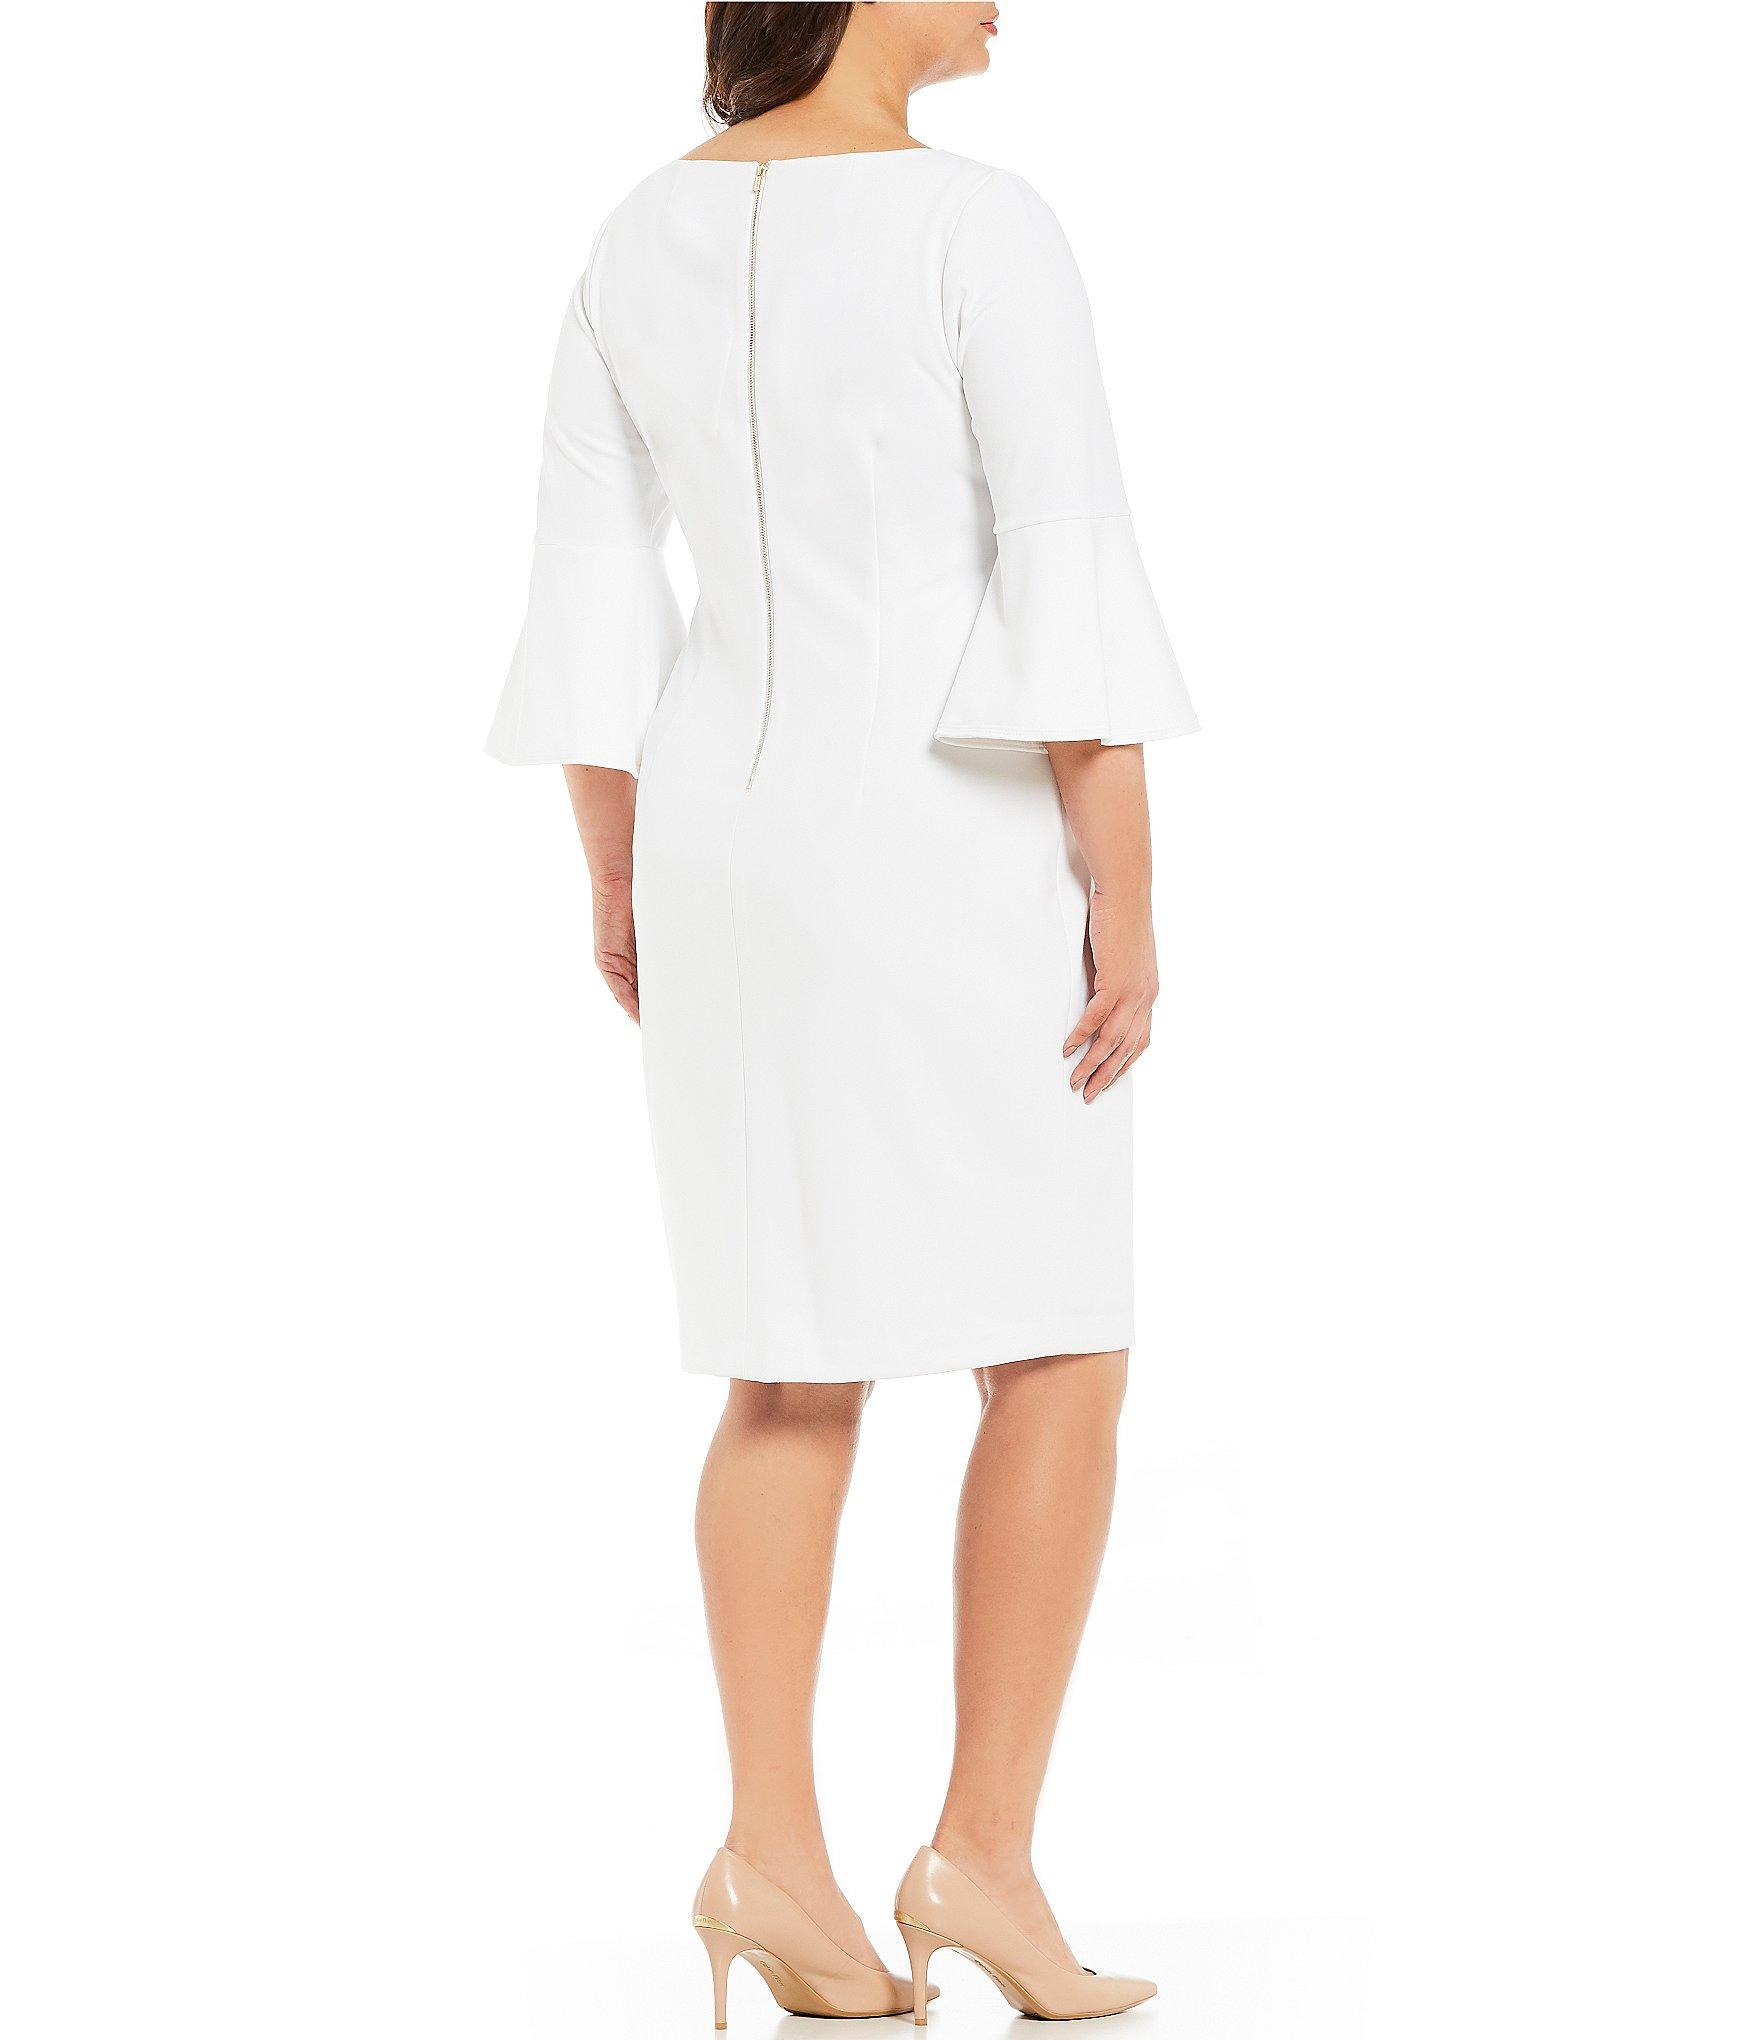 4a42f48621 Calvin Klein - White Plus Size Round Neck Bell Sleeve Sheath Dress - Lyst.  View fullscreen